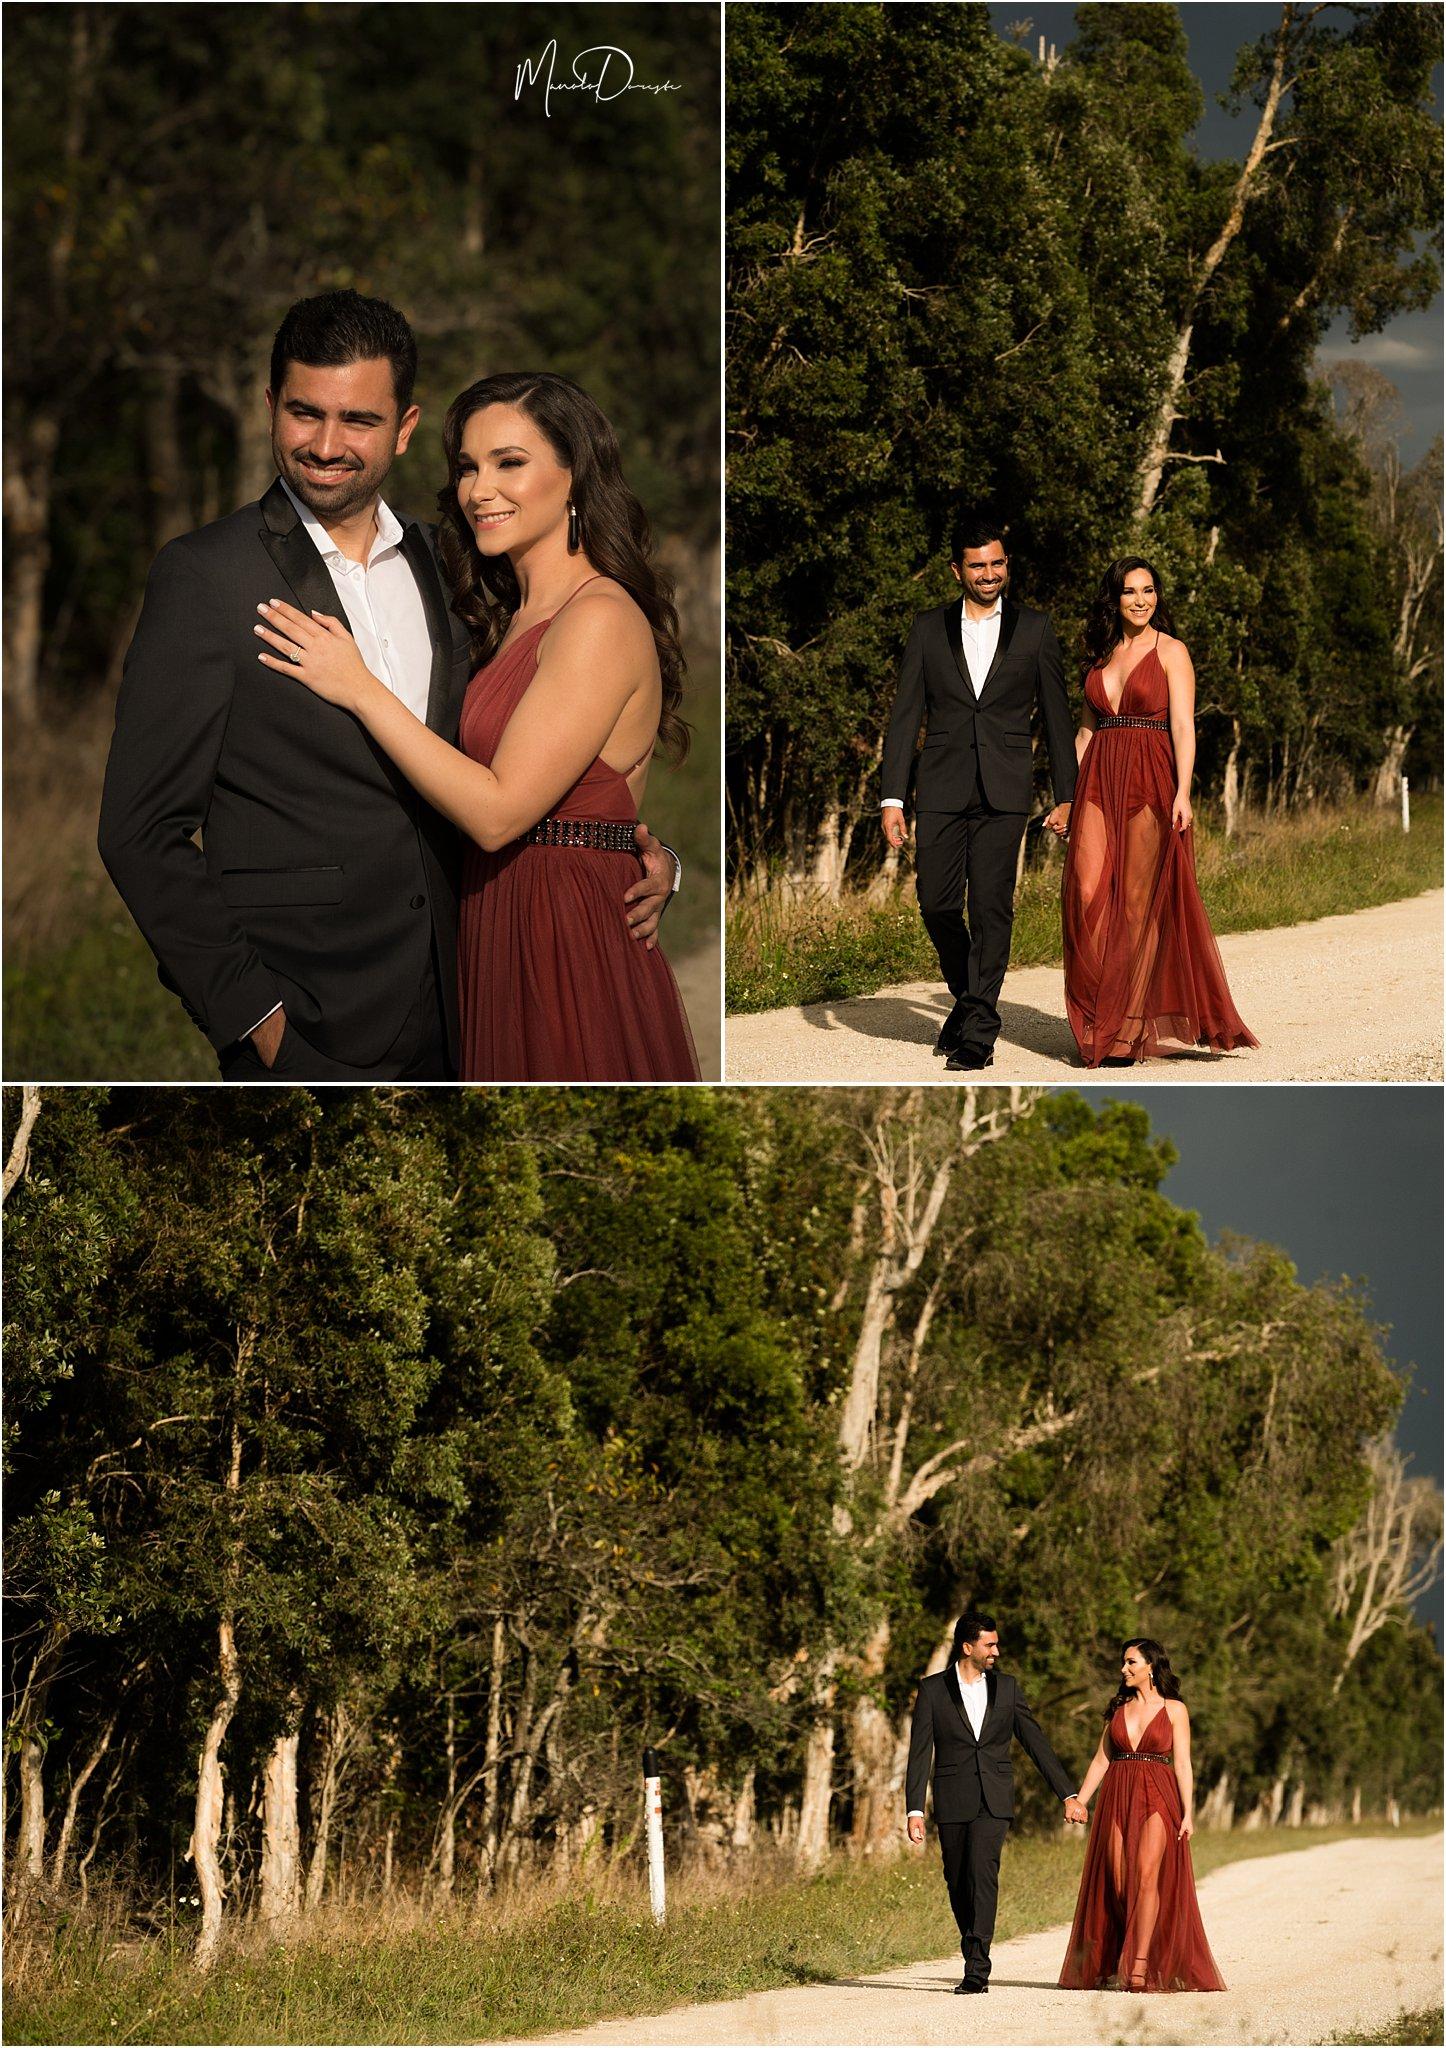 00811_ManoloDoreste_InFocusStudios_Wedding_Family_Photography_Miami_MiamiPhotographer.jpg